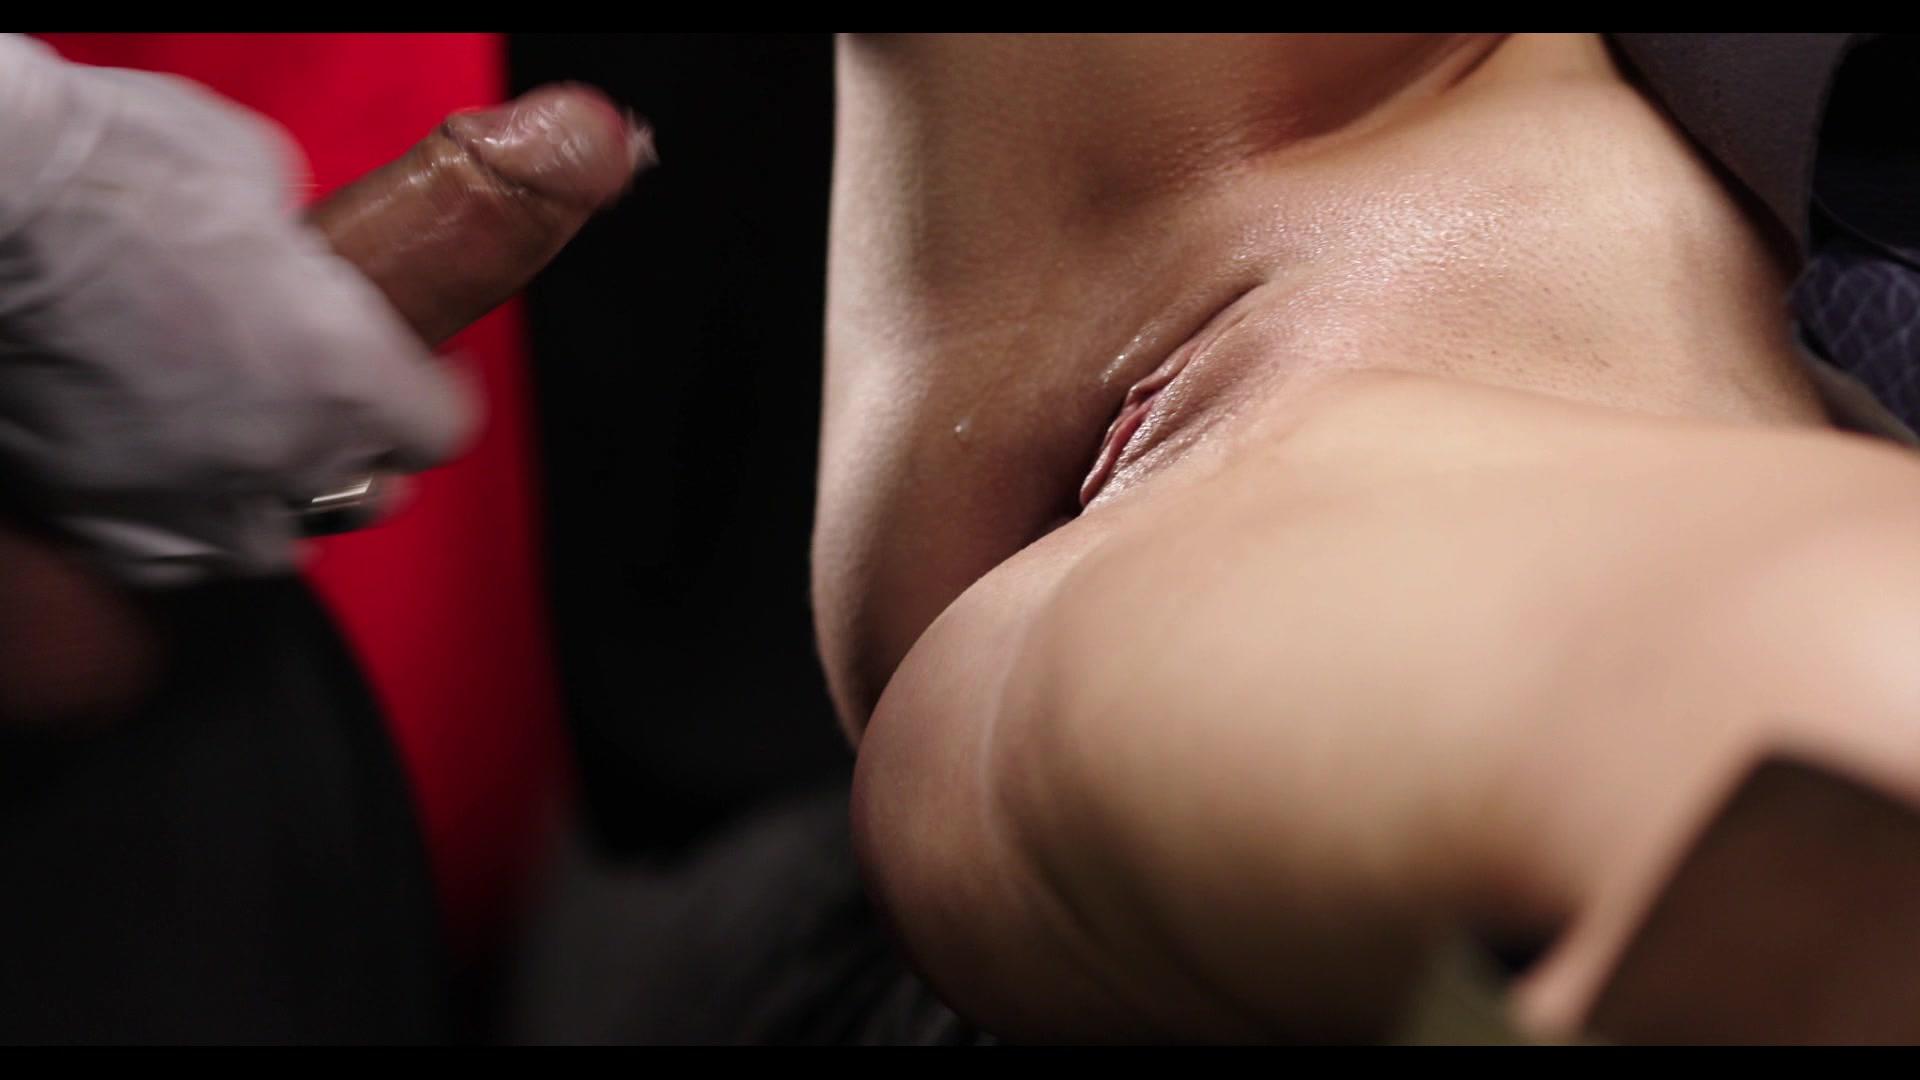 Scene with Xander Corvus, Tyler Nixon and Romi Rain - image 8 out of 20